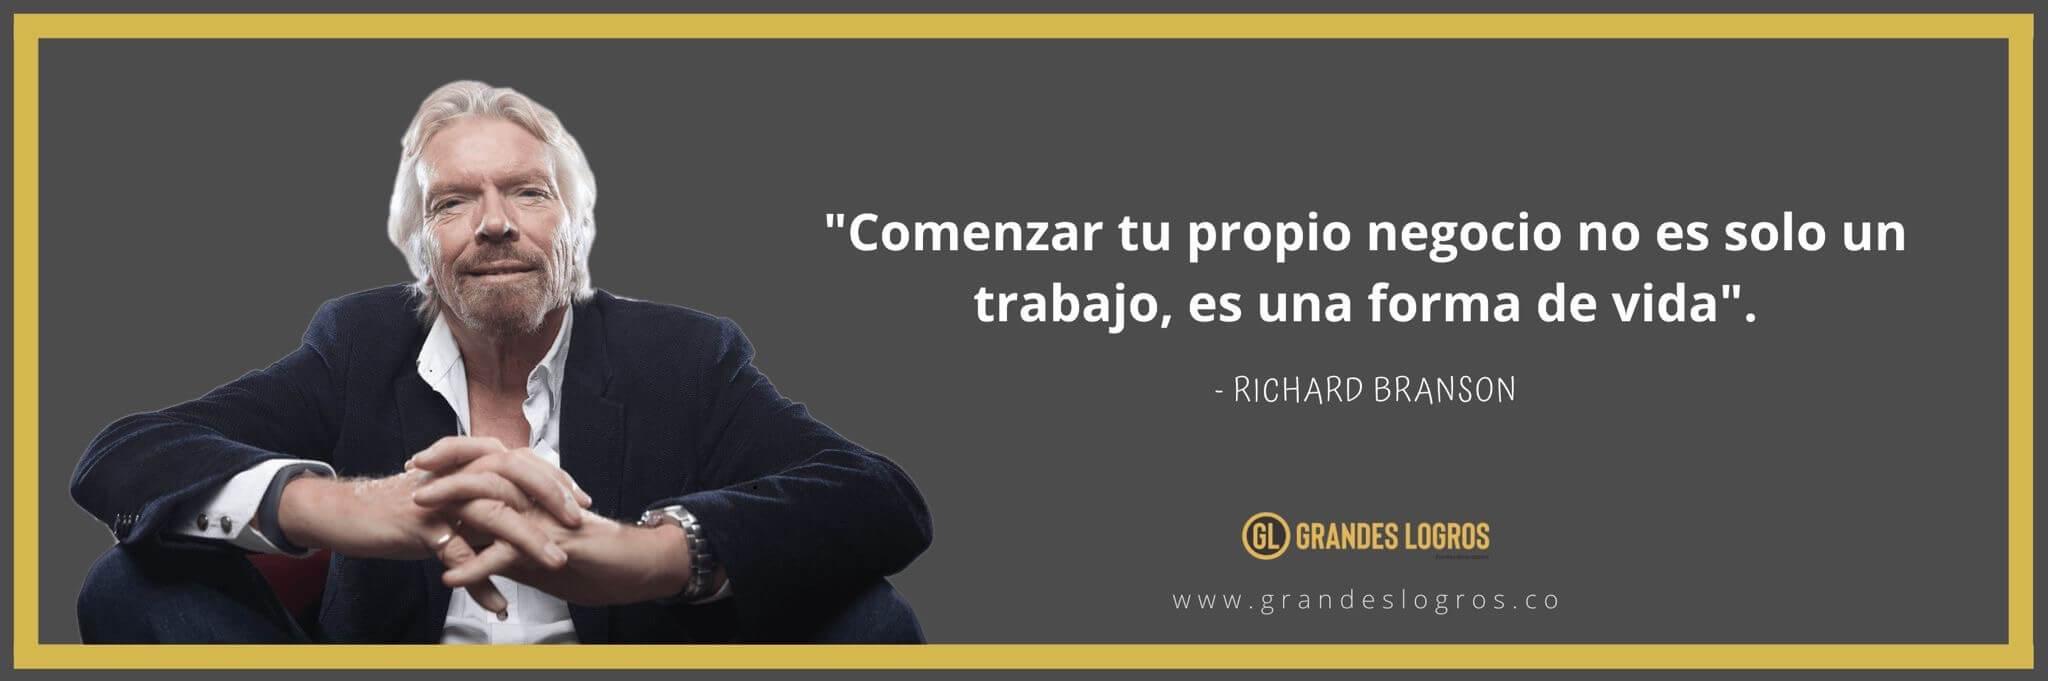 frases de Richard Branson sobre integridad